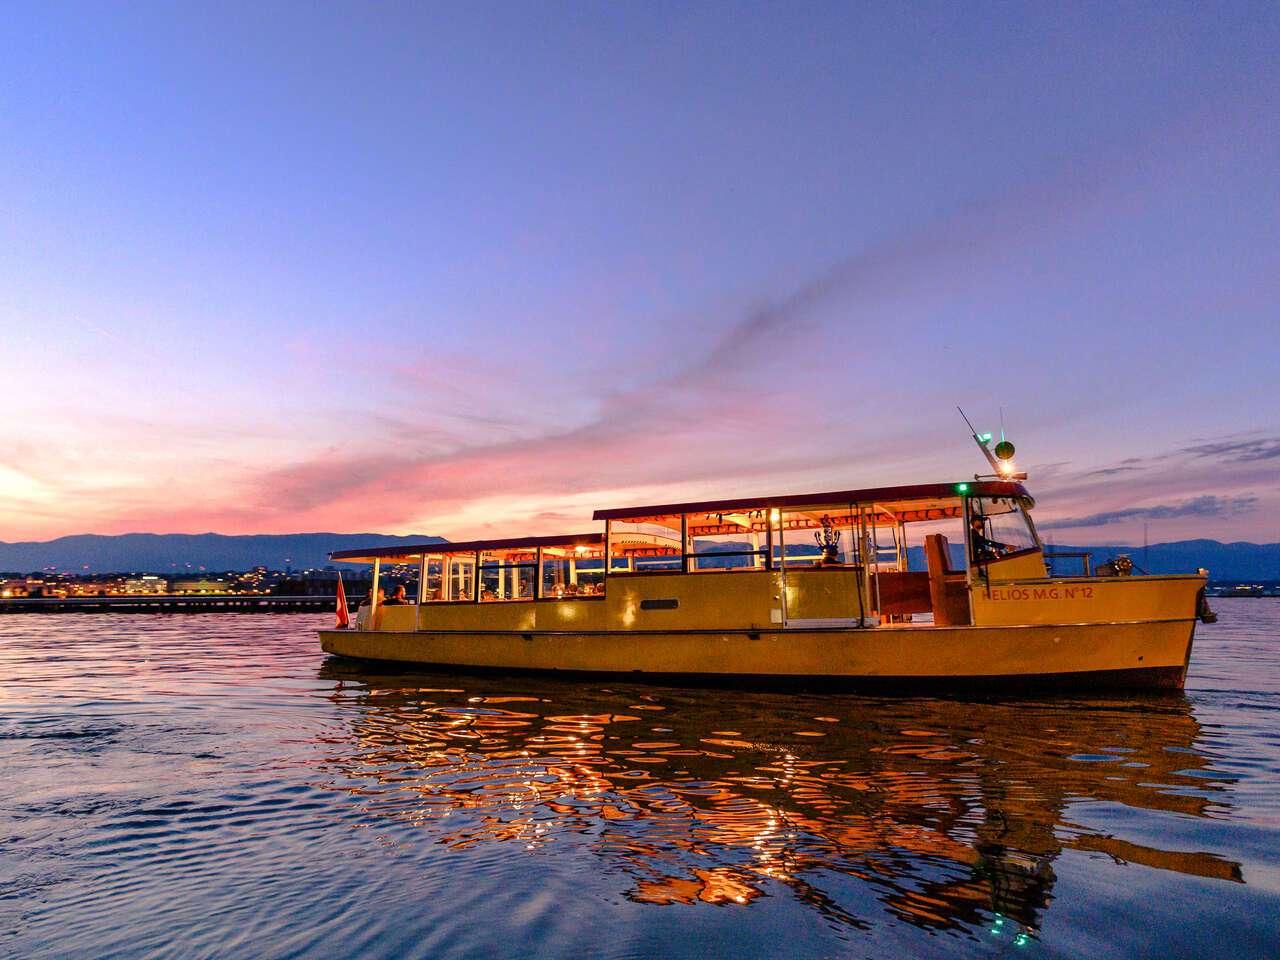 A mouette at sunset on Lake Geneva